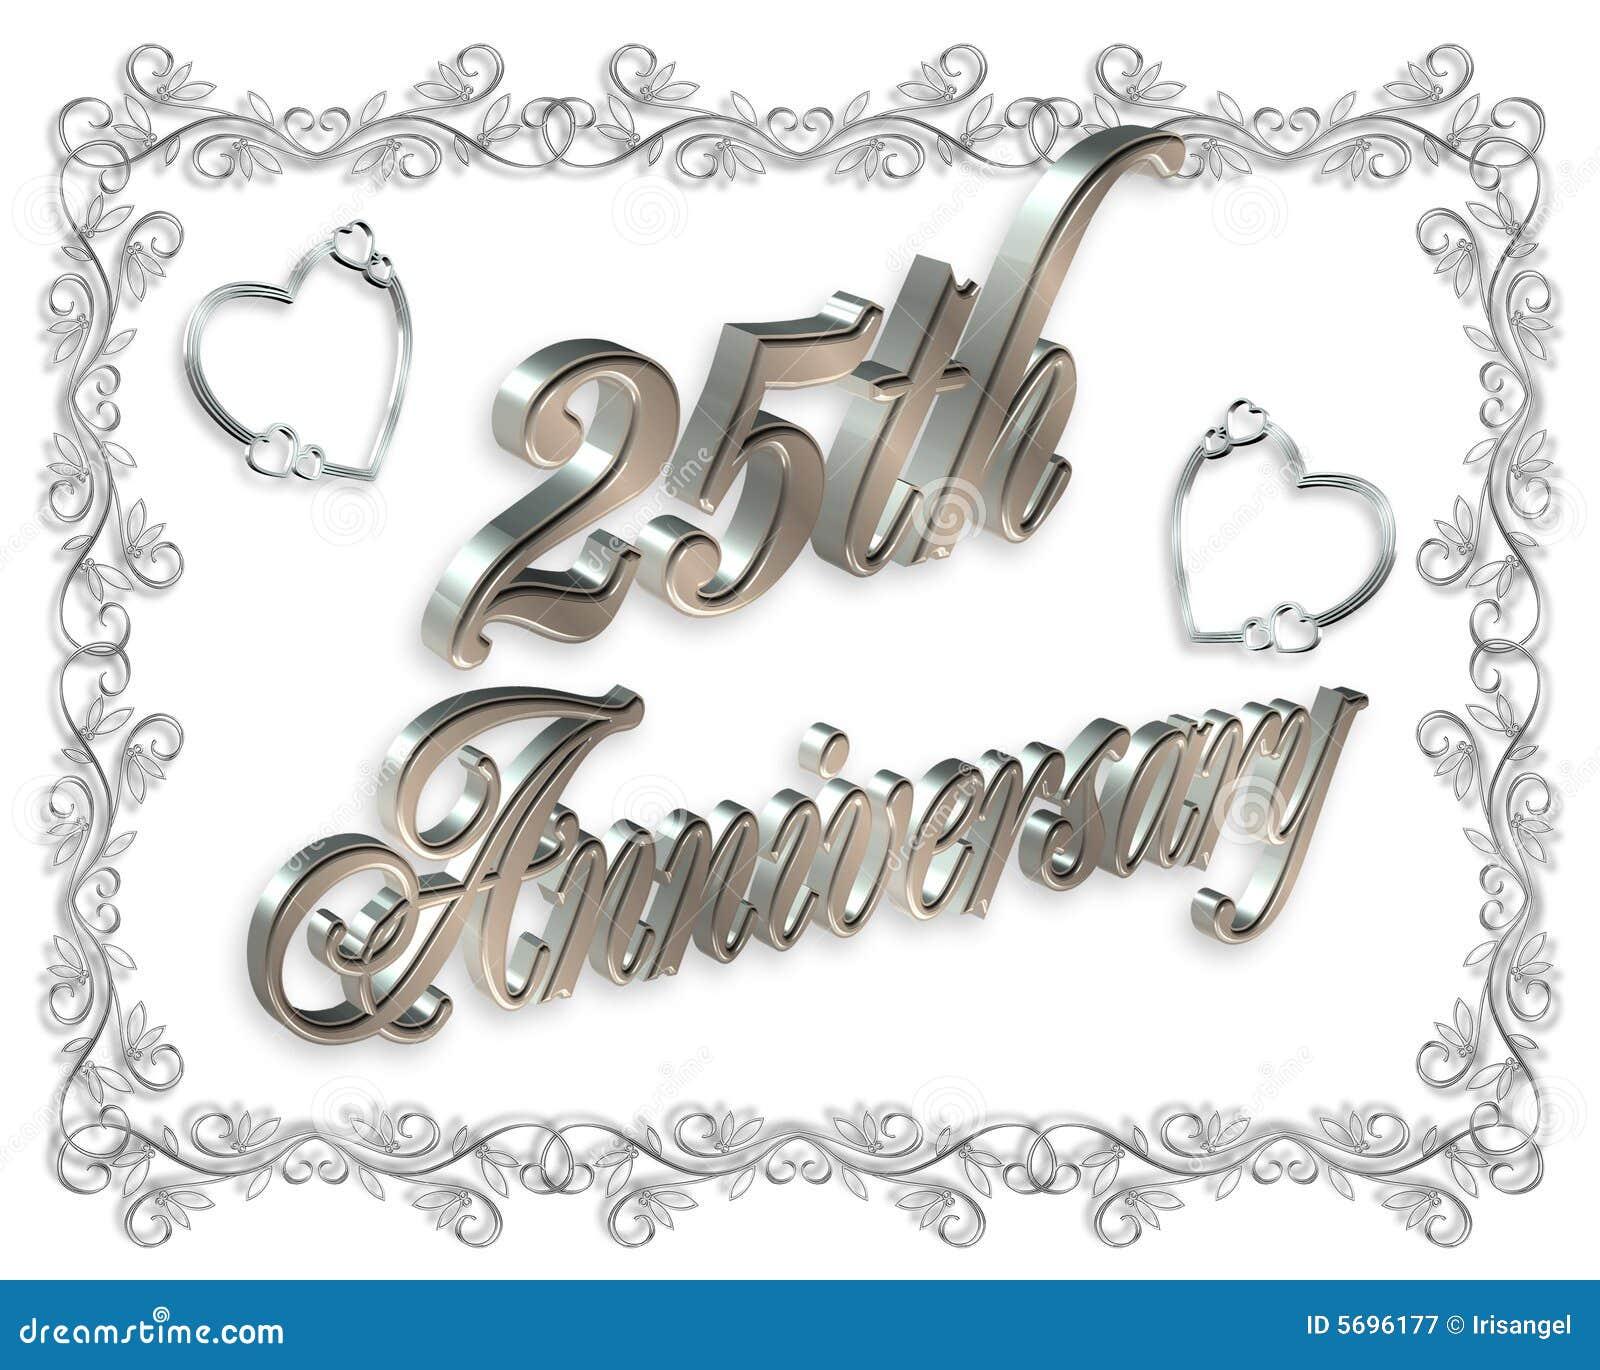 free silver wedding anniversary clipart - photo #24